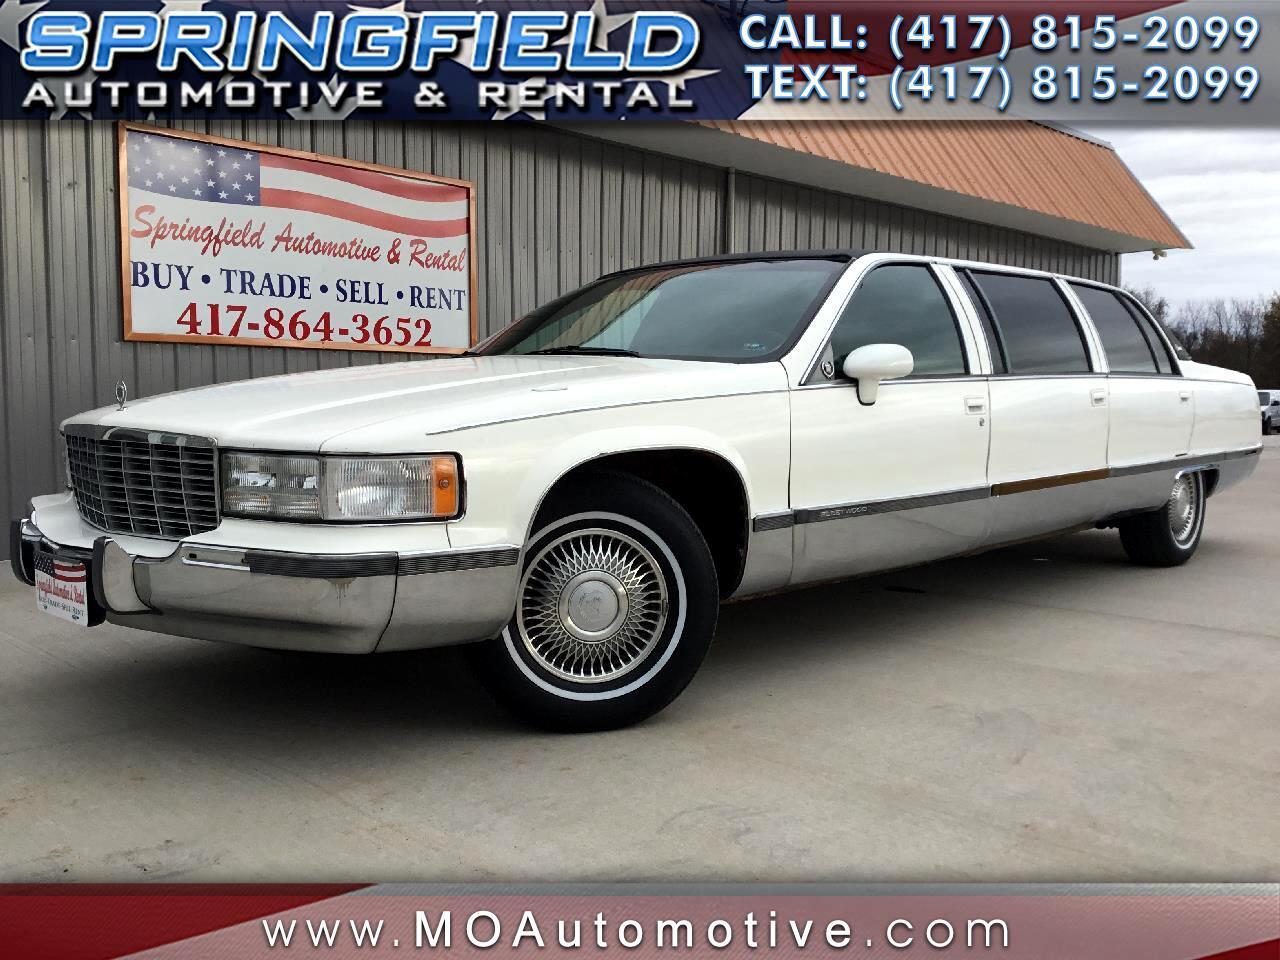 1994 Cadillac Fleetwood 6dr Limo